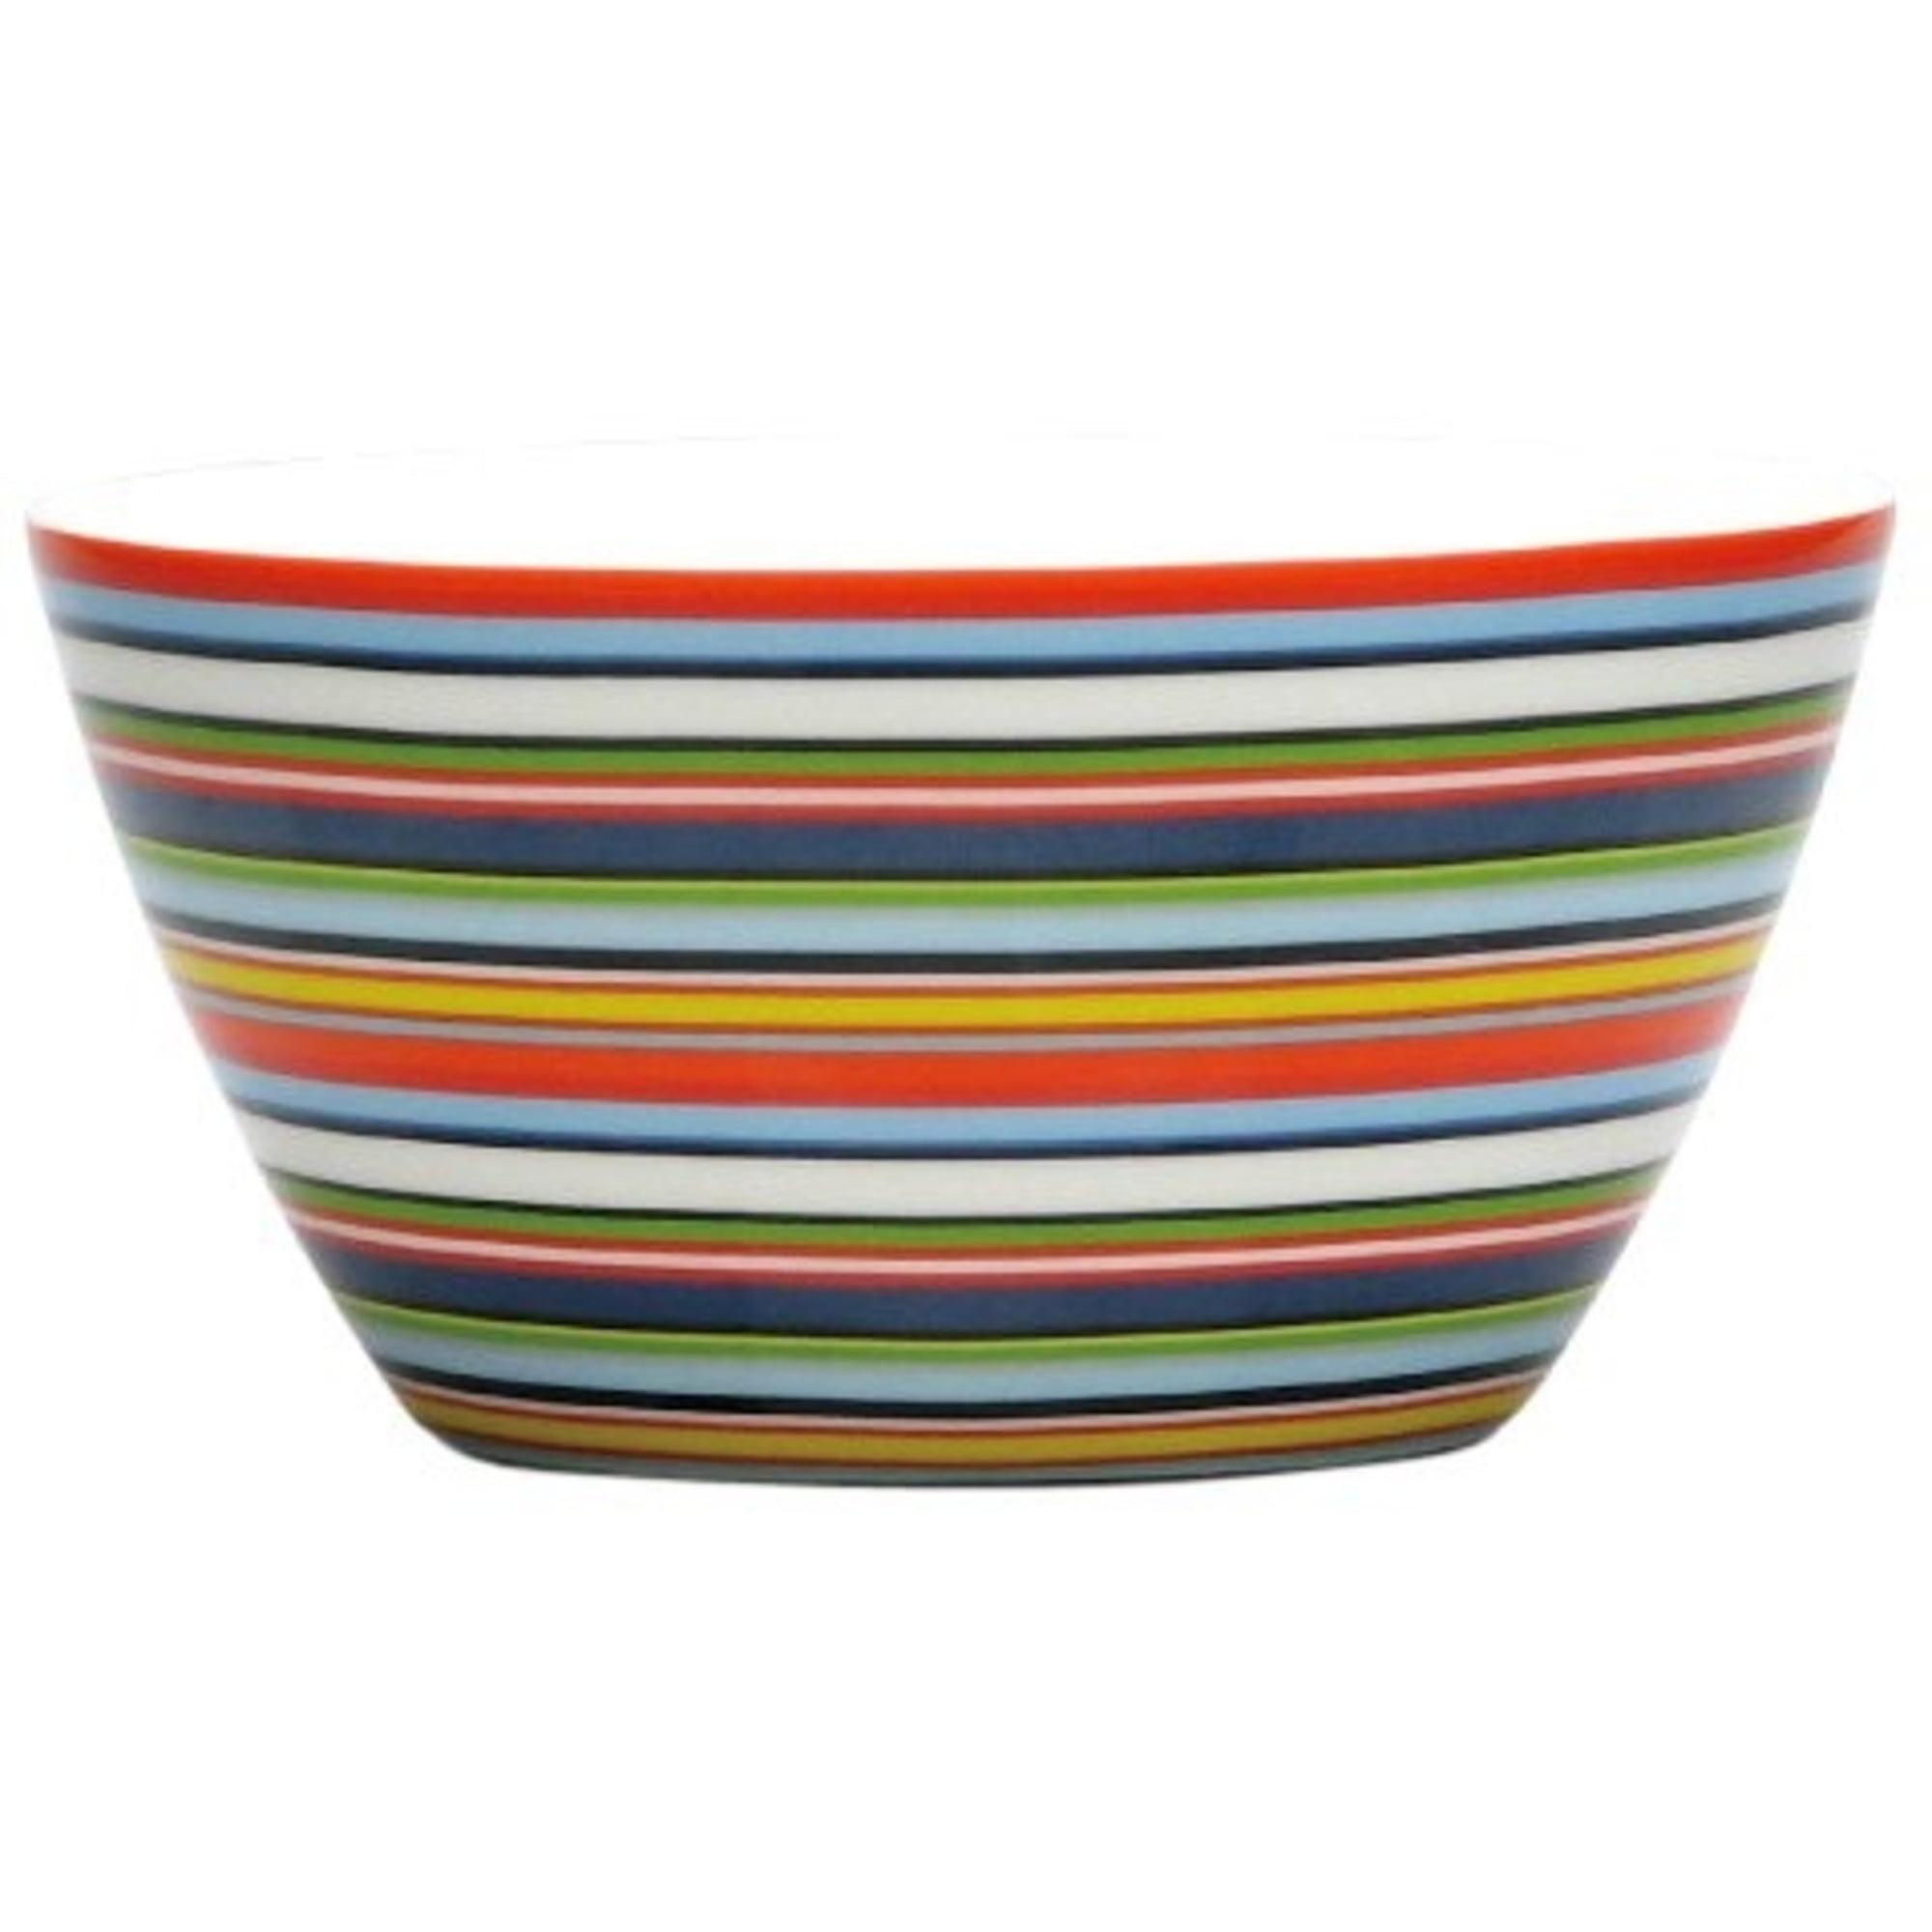 iittala Origo Pasta Bowl Stripes Design 0.5 L by iittala